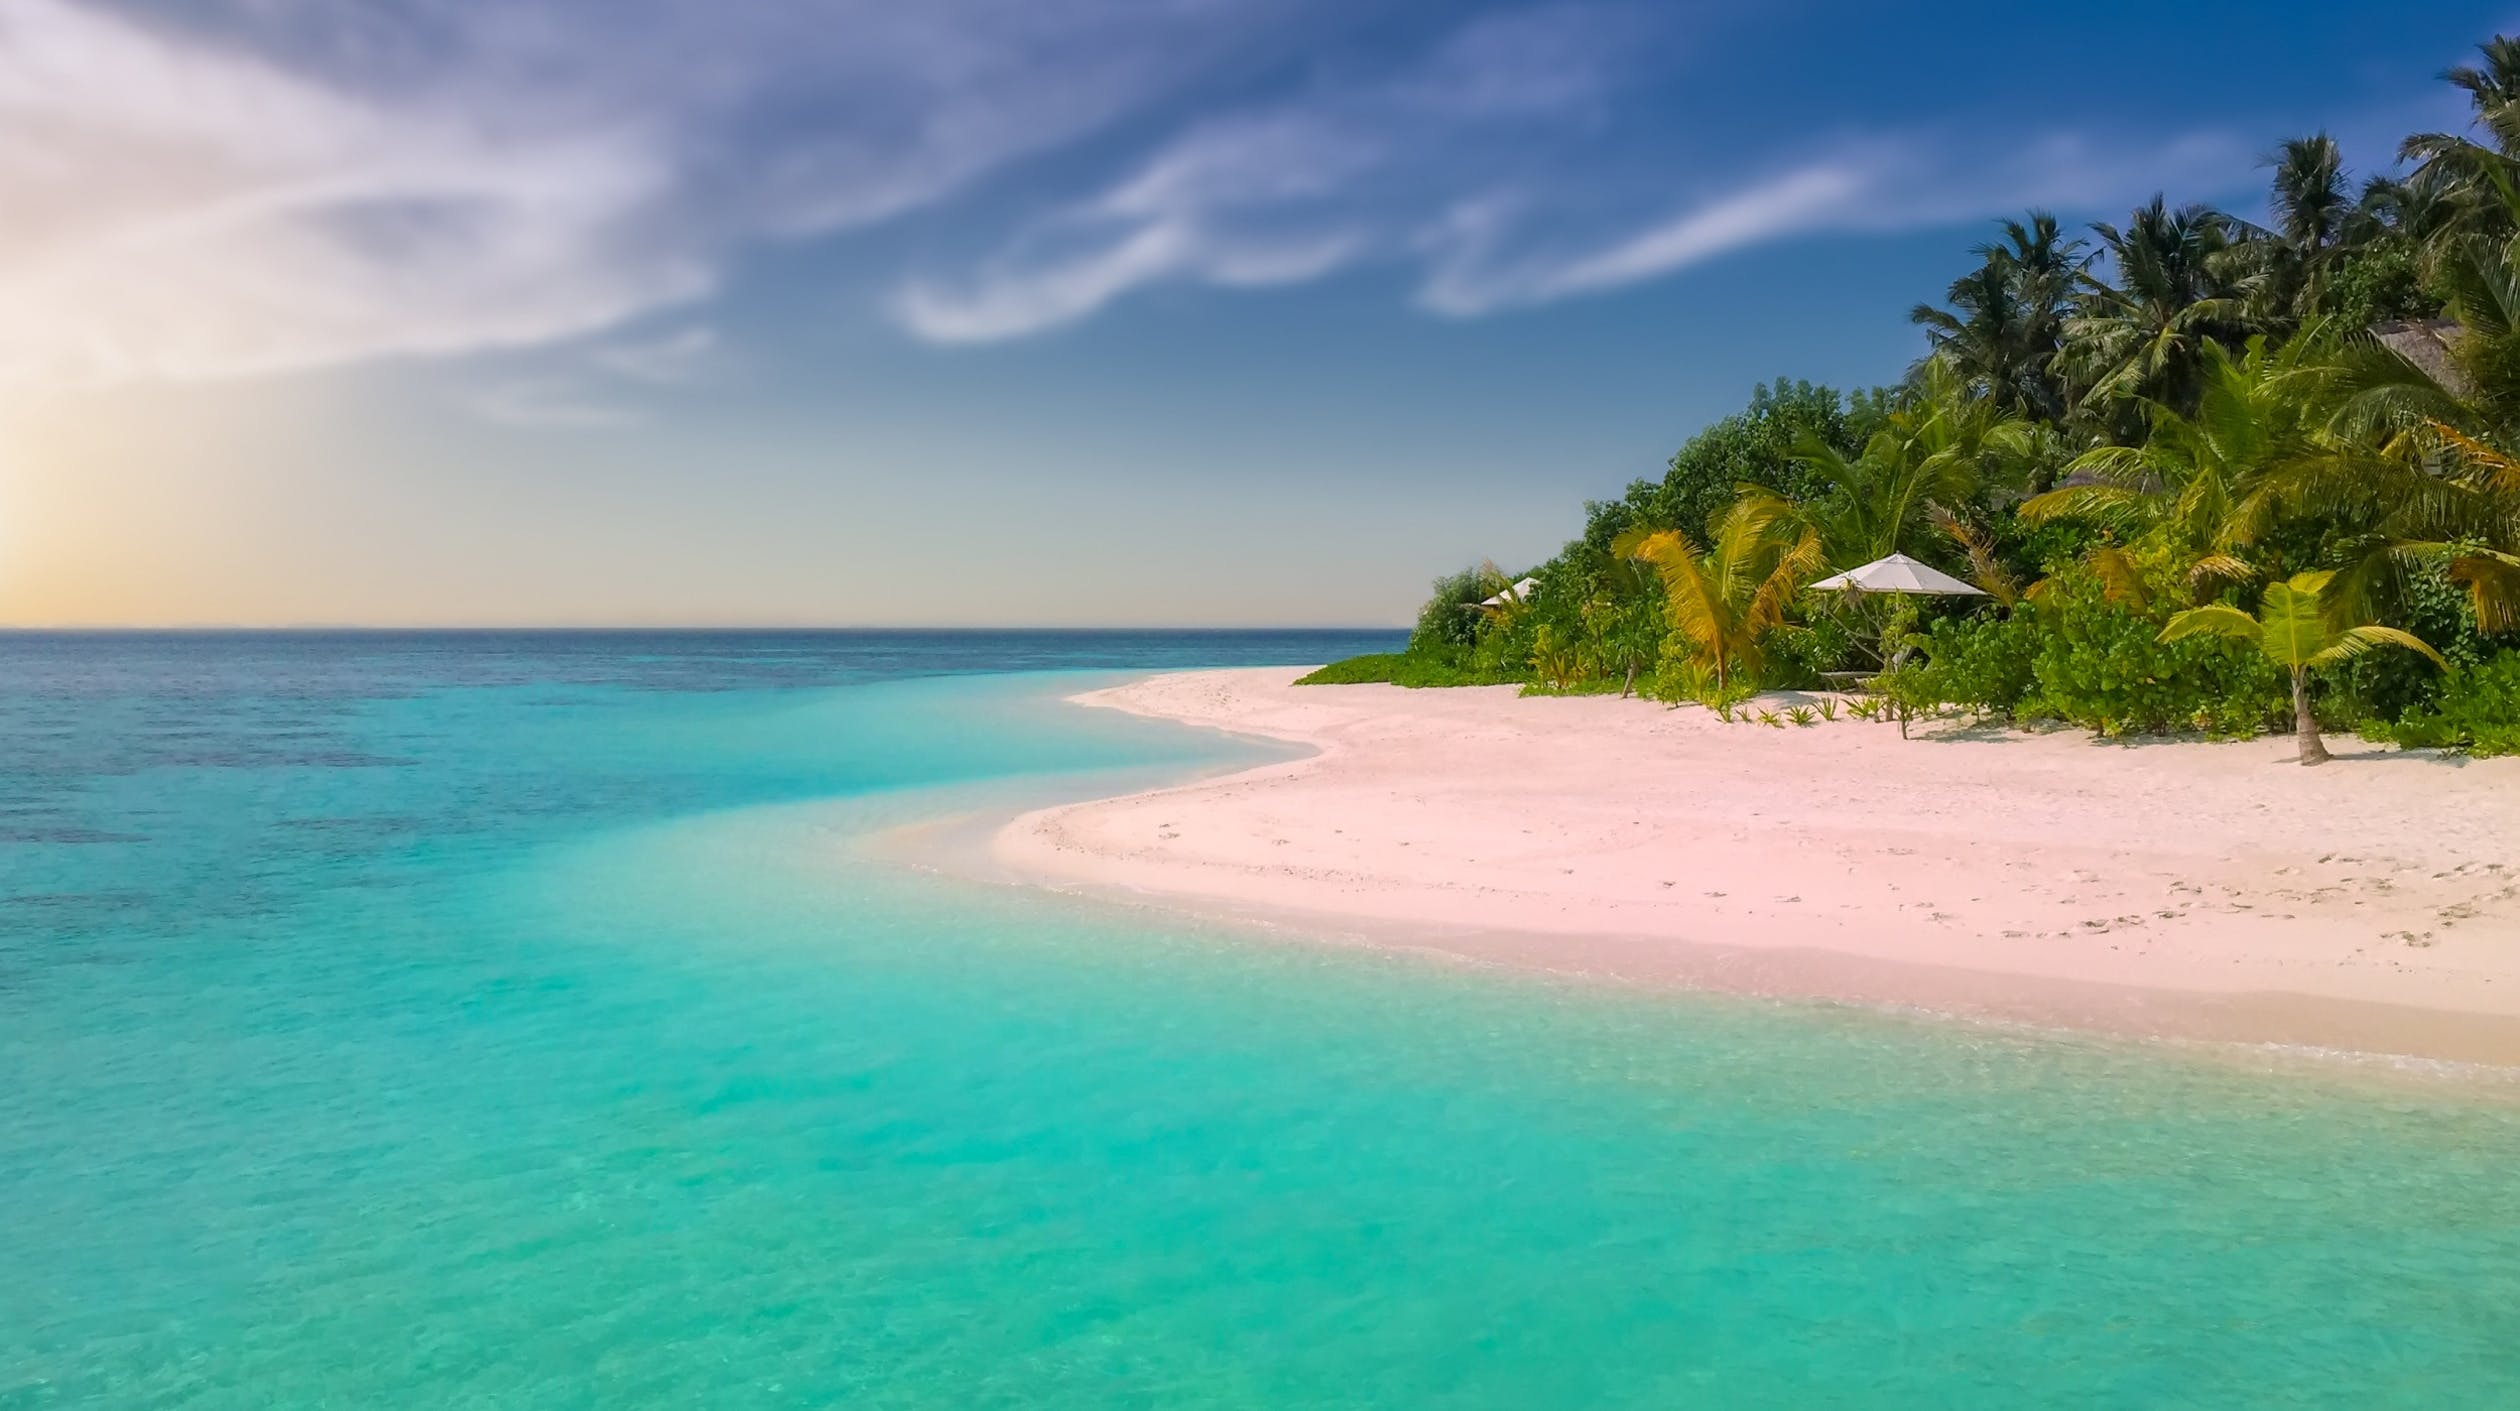 4 Nights Stay in Deluxe Villa at Baros Maldives